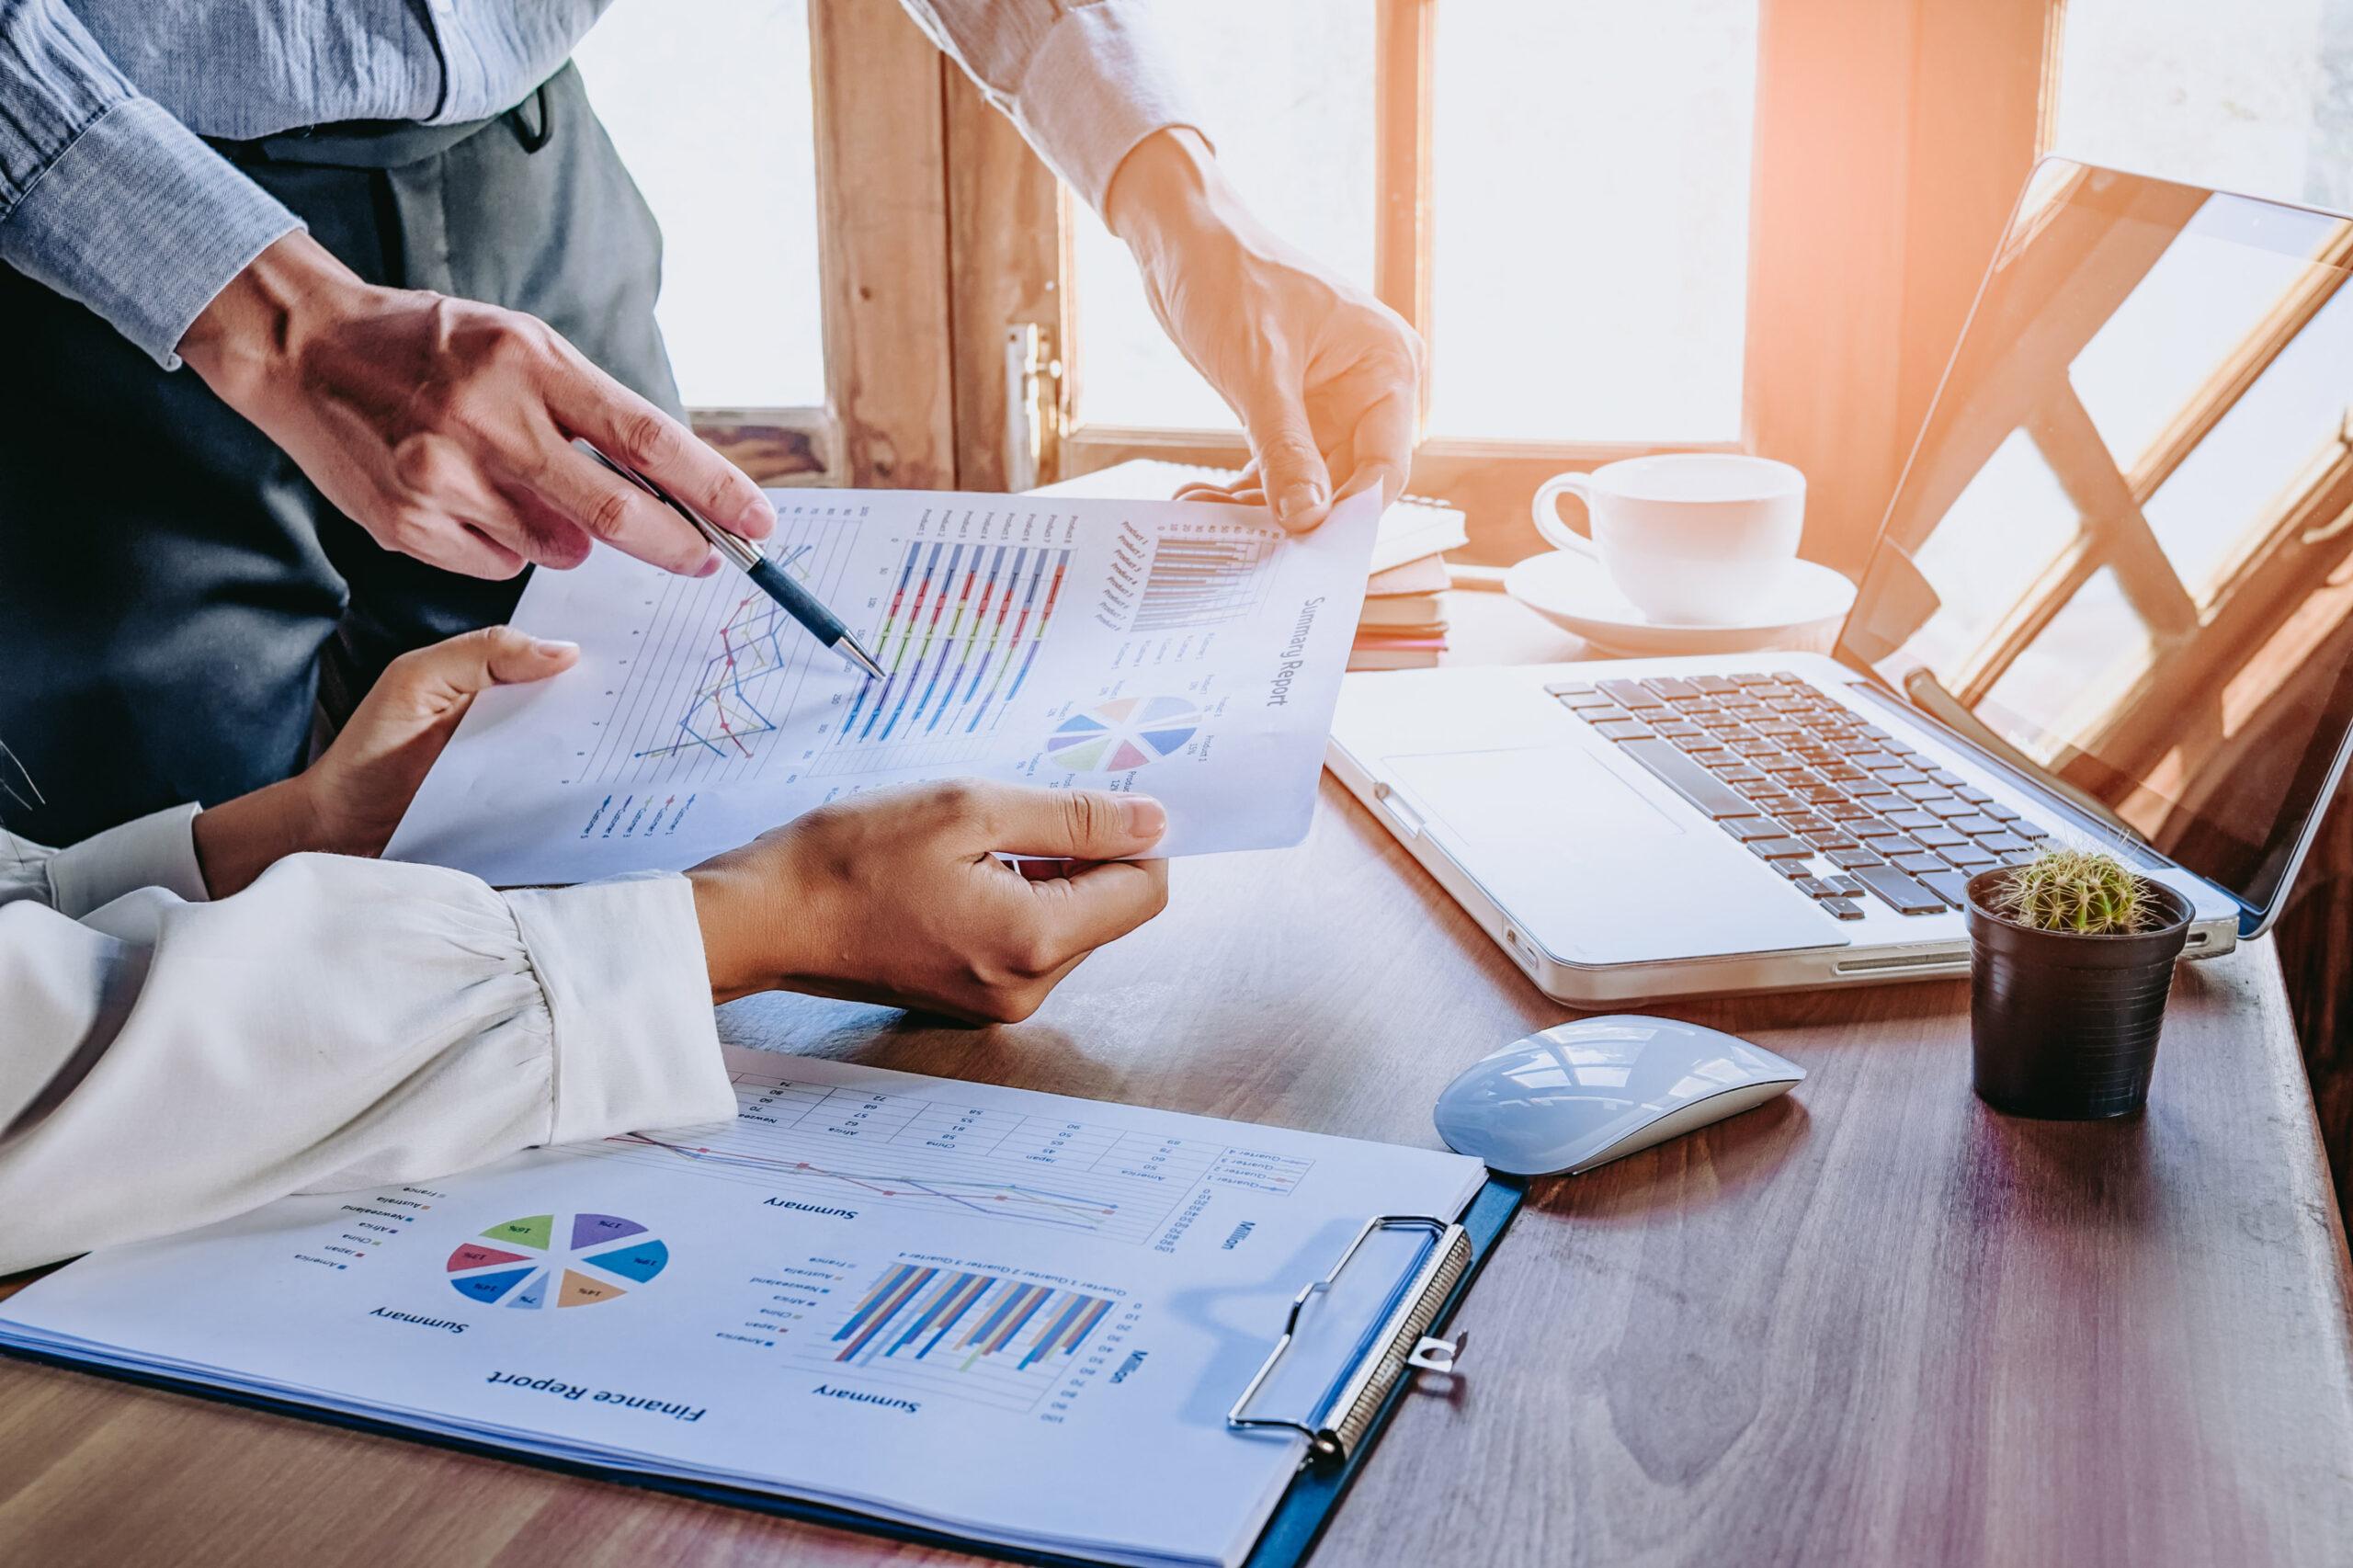 project portfolio management system